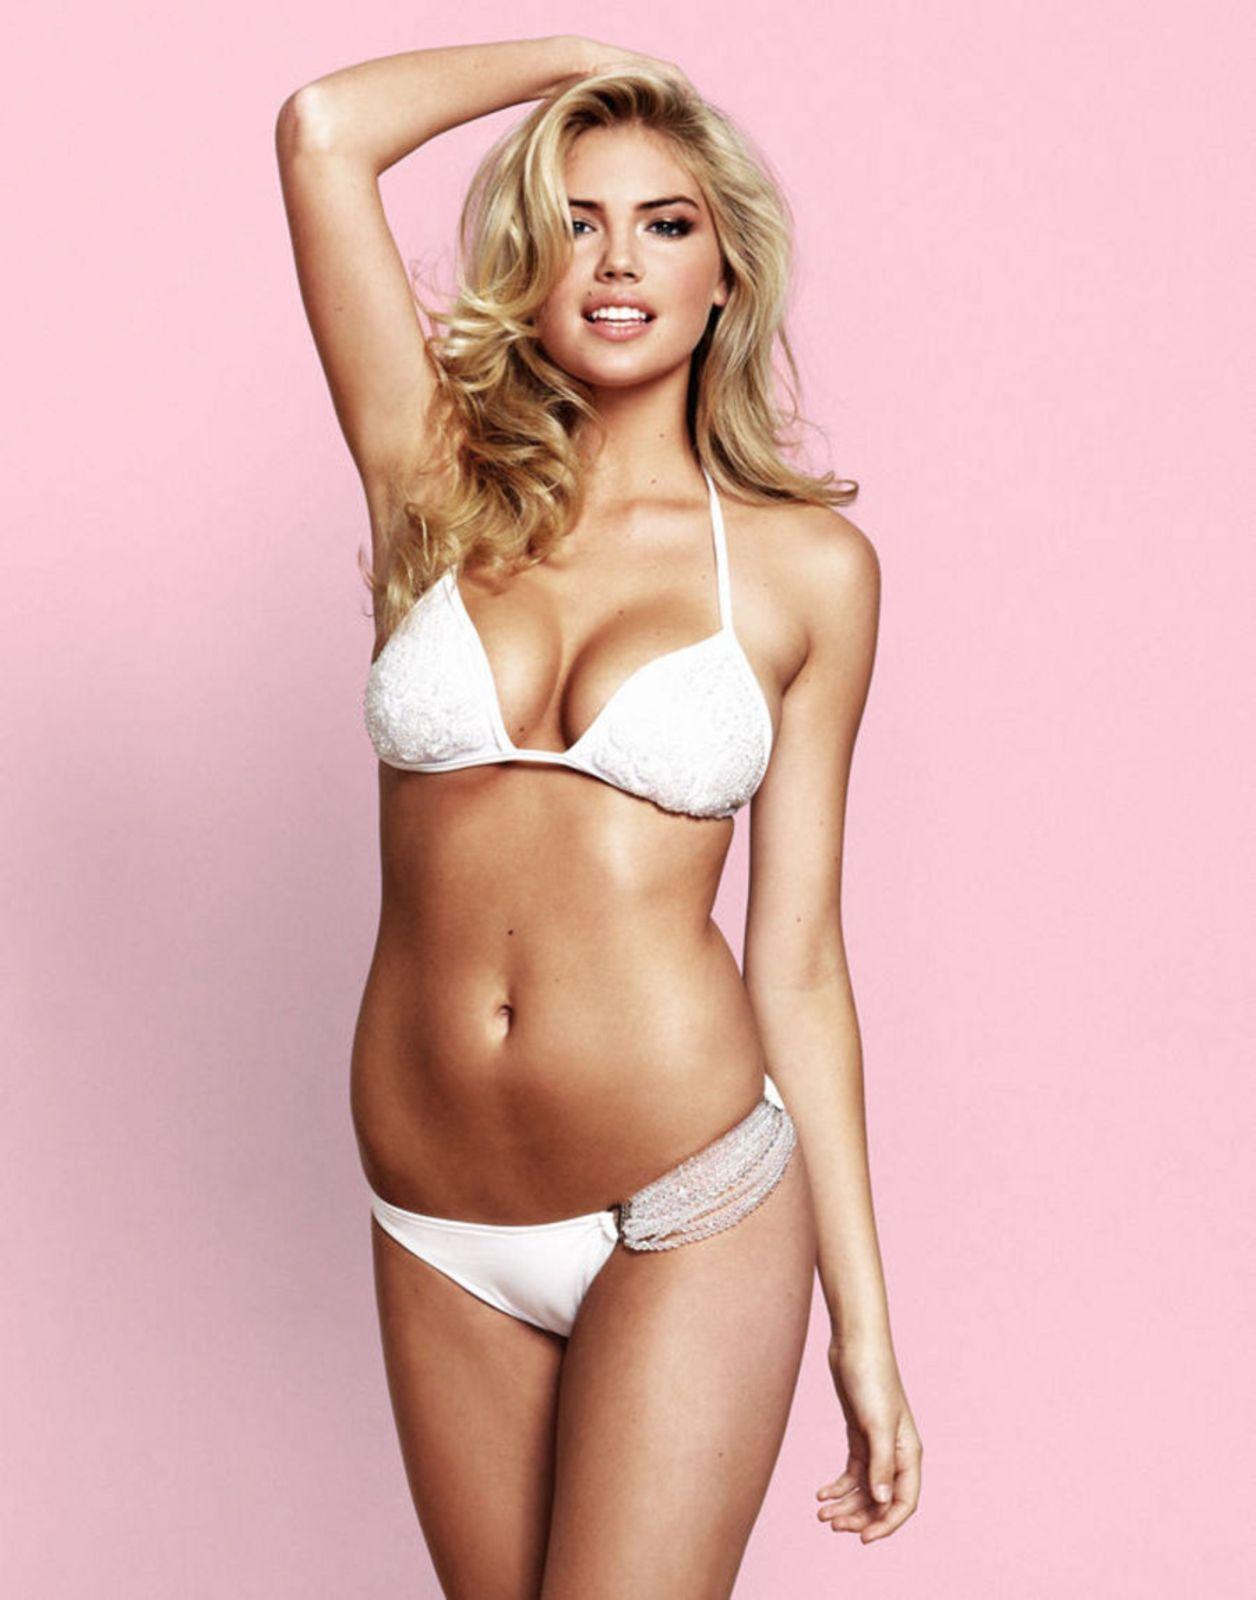 World Celebrity Image: American Model Kate Upton White